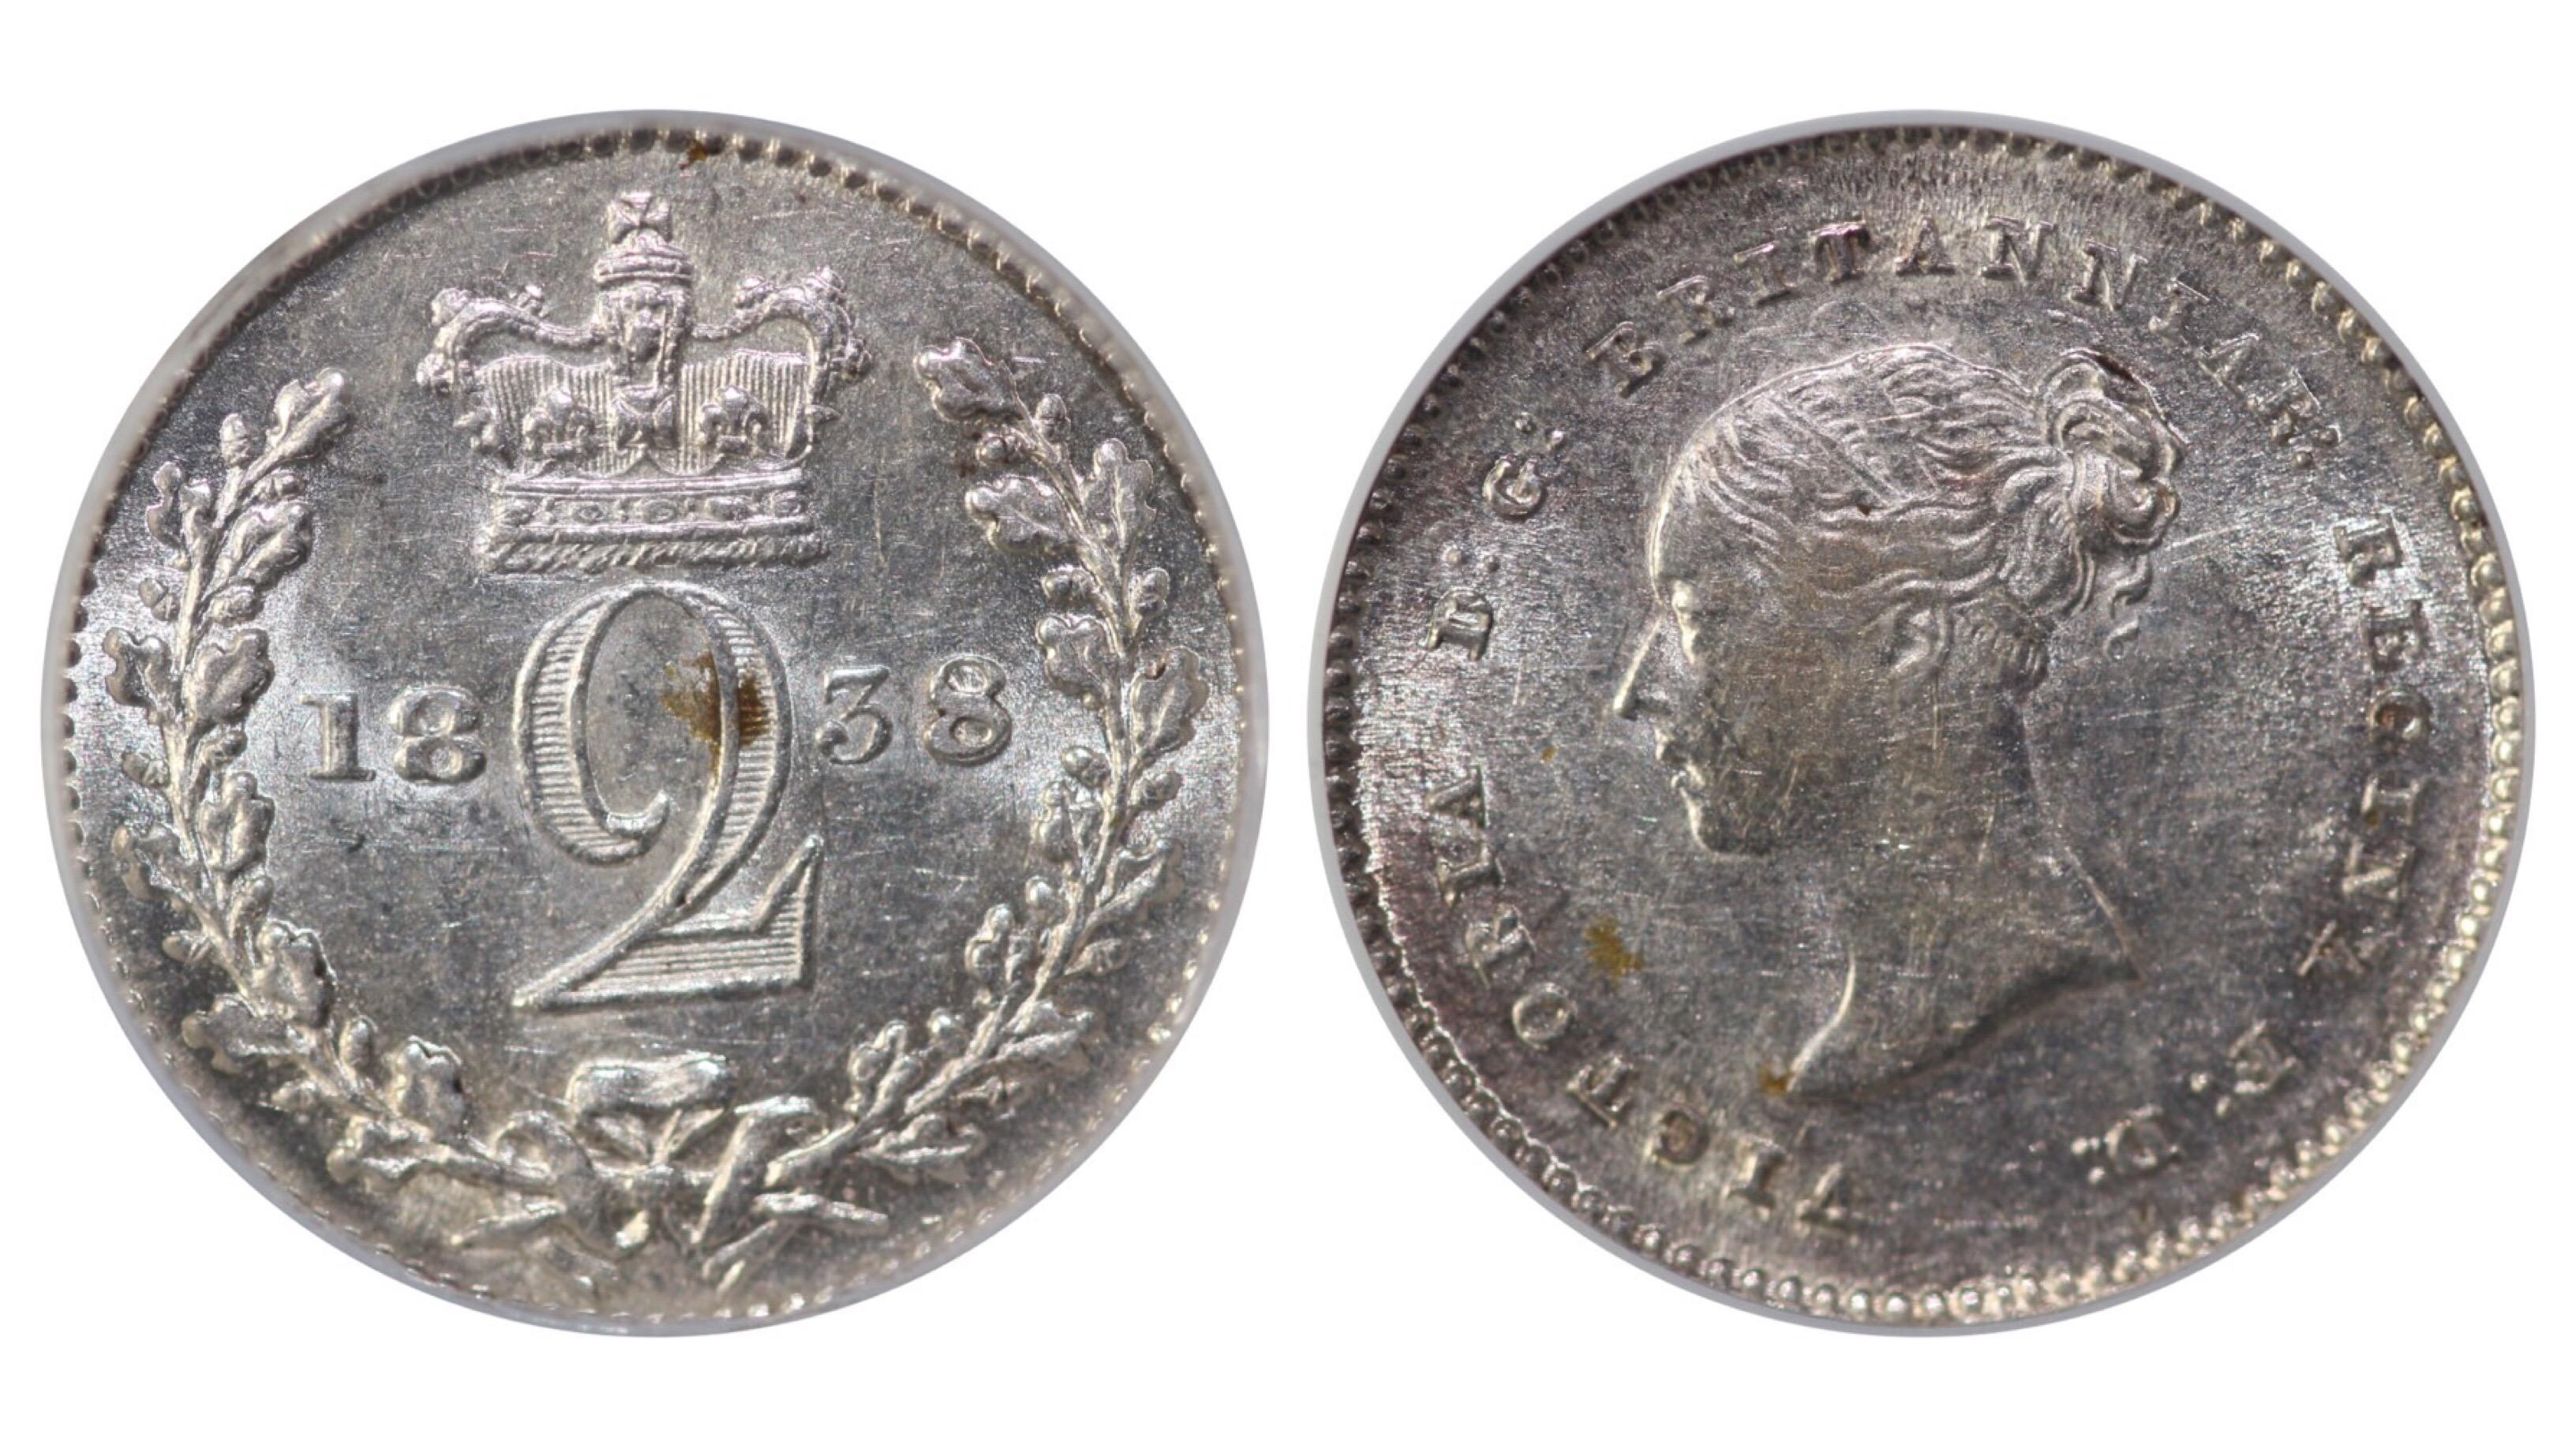 1838 Twopence, '8' reads 'S,' CGS 65, Davies 1371, UIN 19503